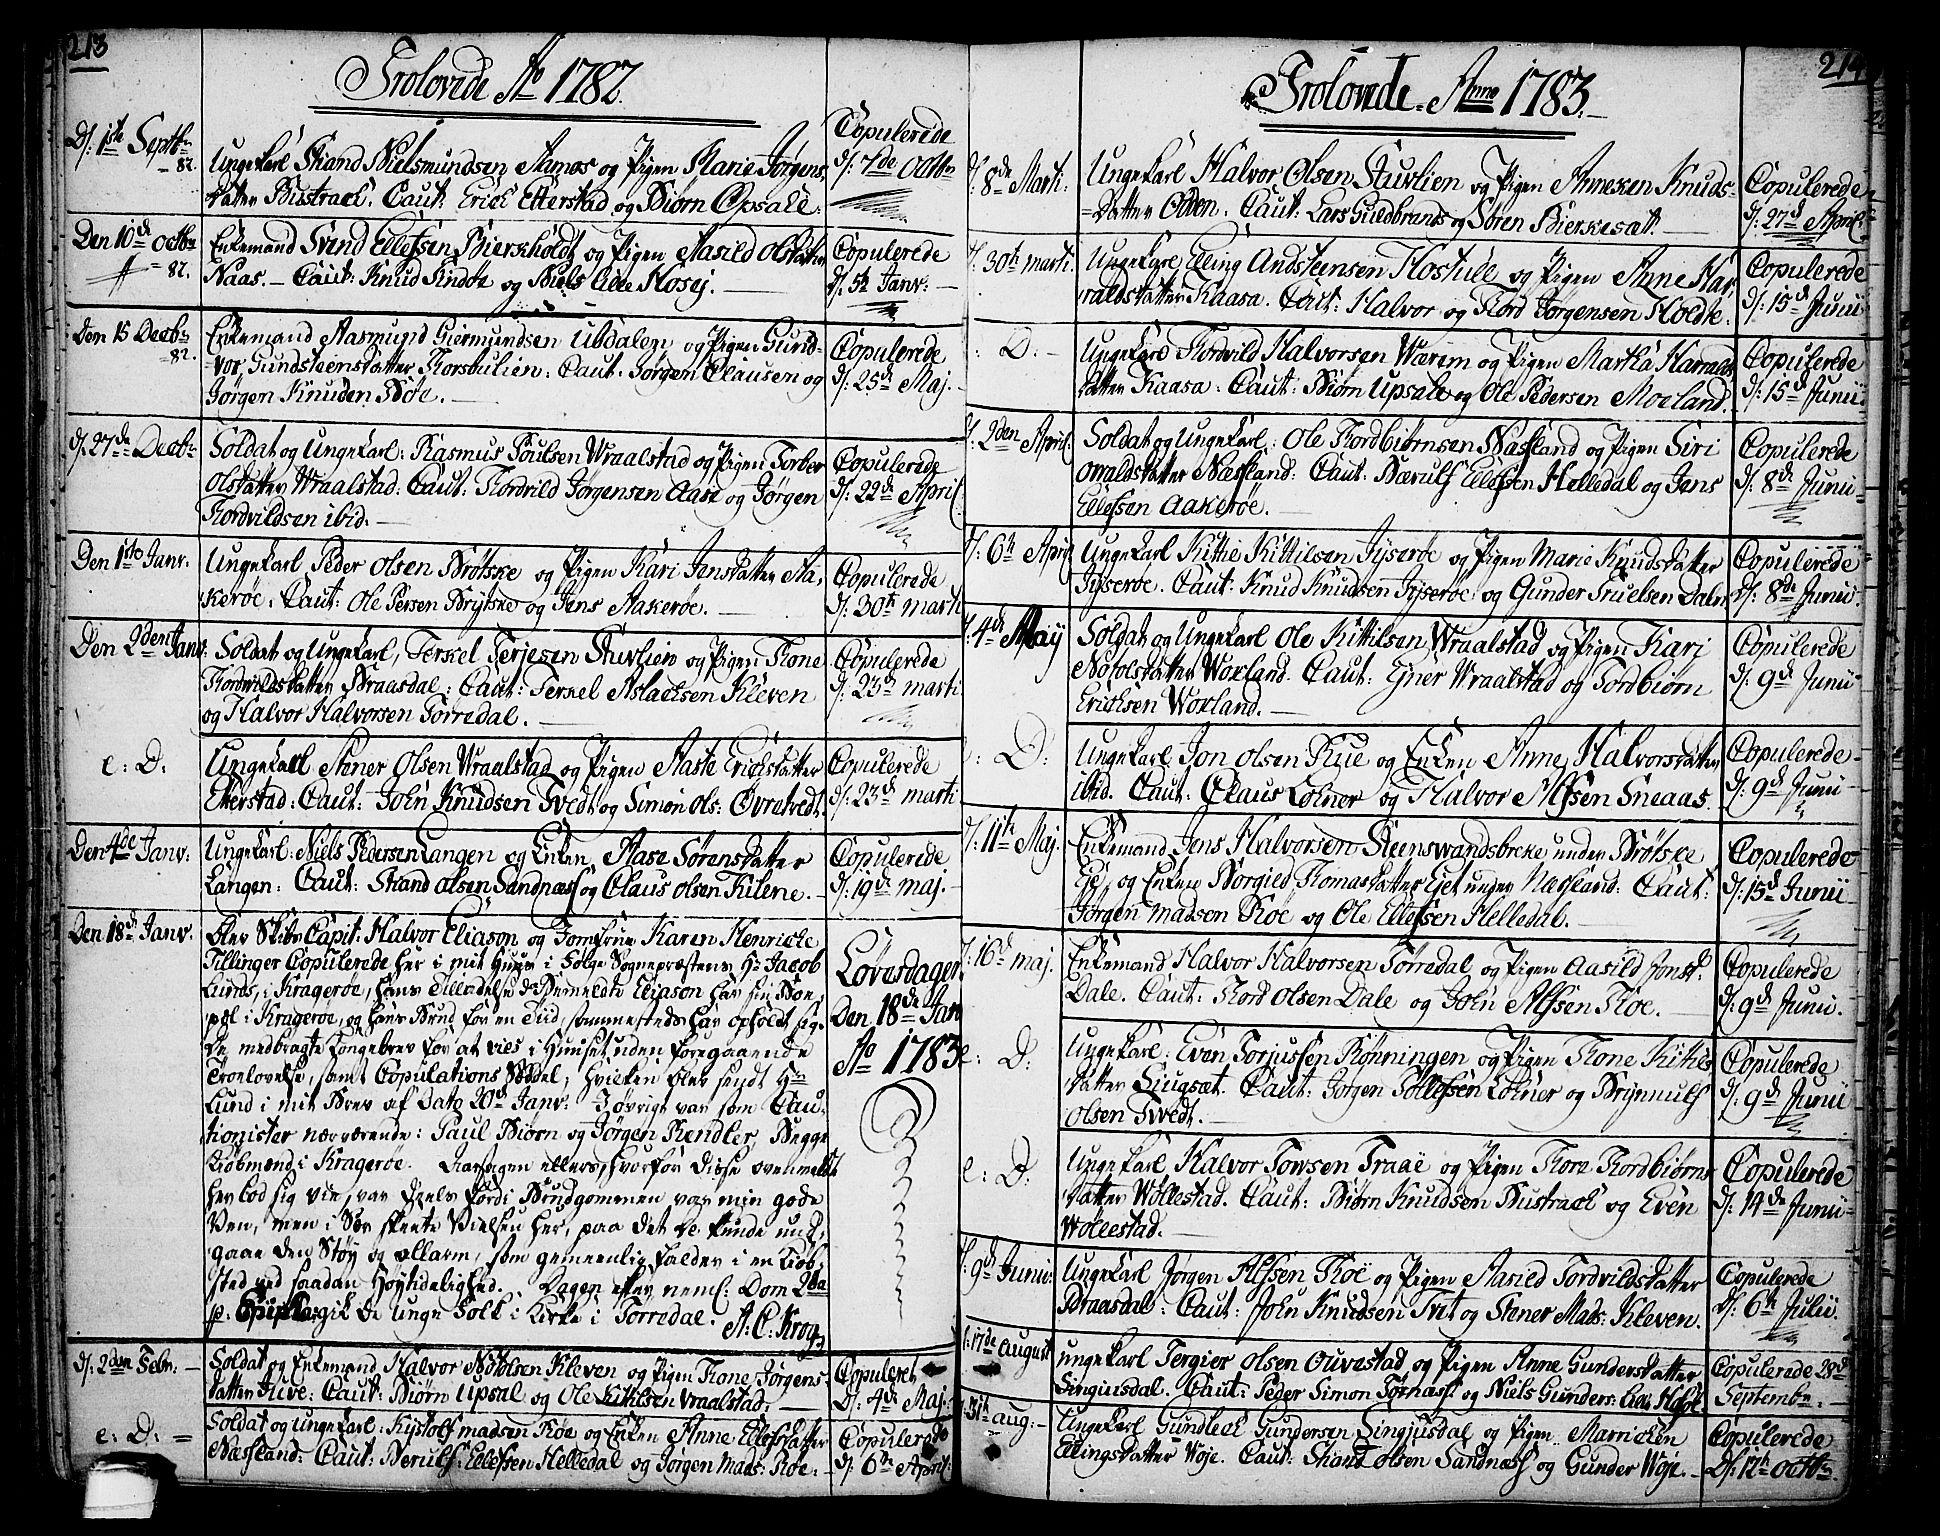 SAKO, Drangedal kirkebøker, F/Fa/L0003: Ministerialbok nr. 3, 1768-1814, s. 213-214